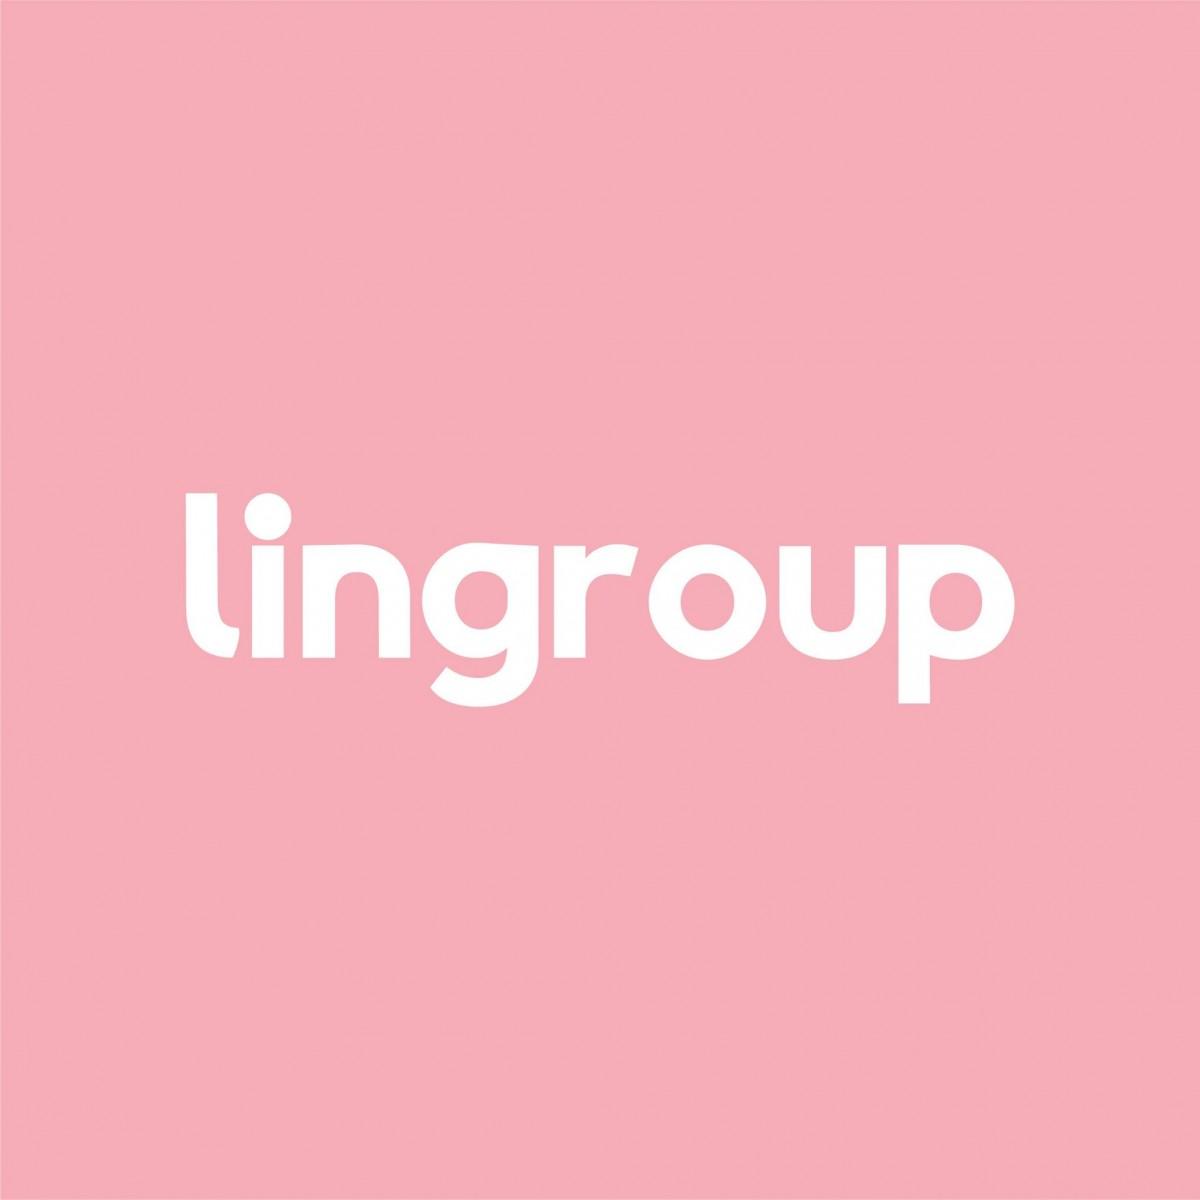 [HN] Lingroup tuyển dụng Graphic Designer